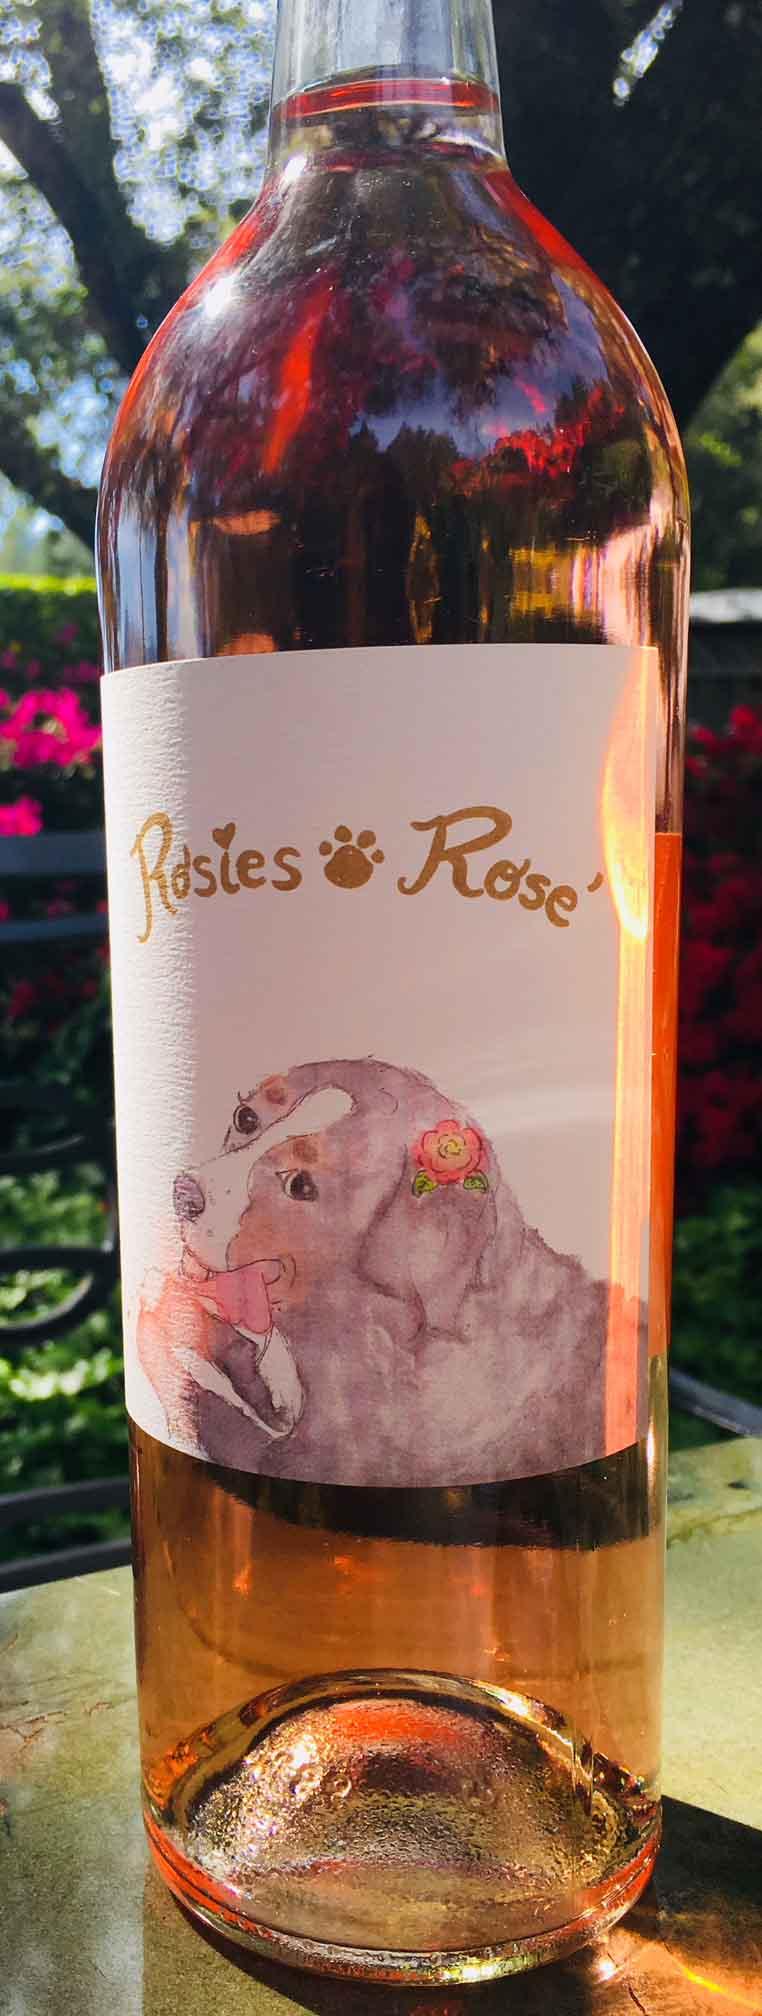 Arietta Rosie's Rose2018